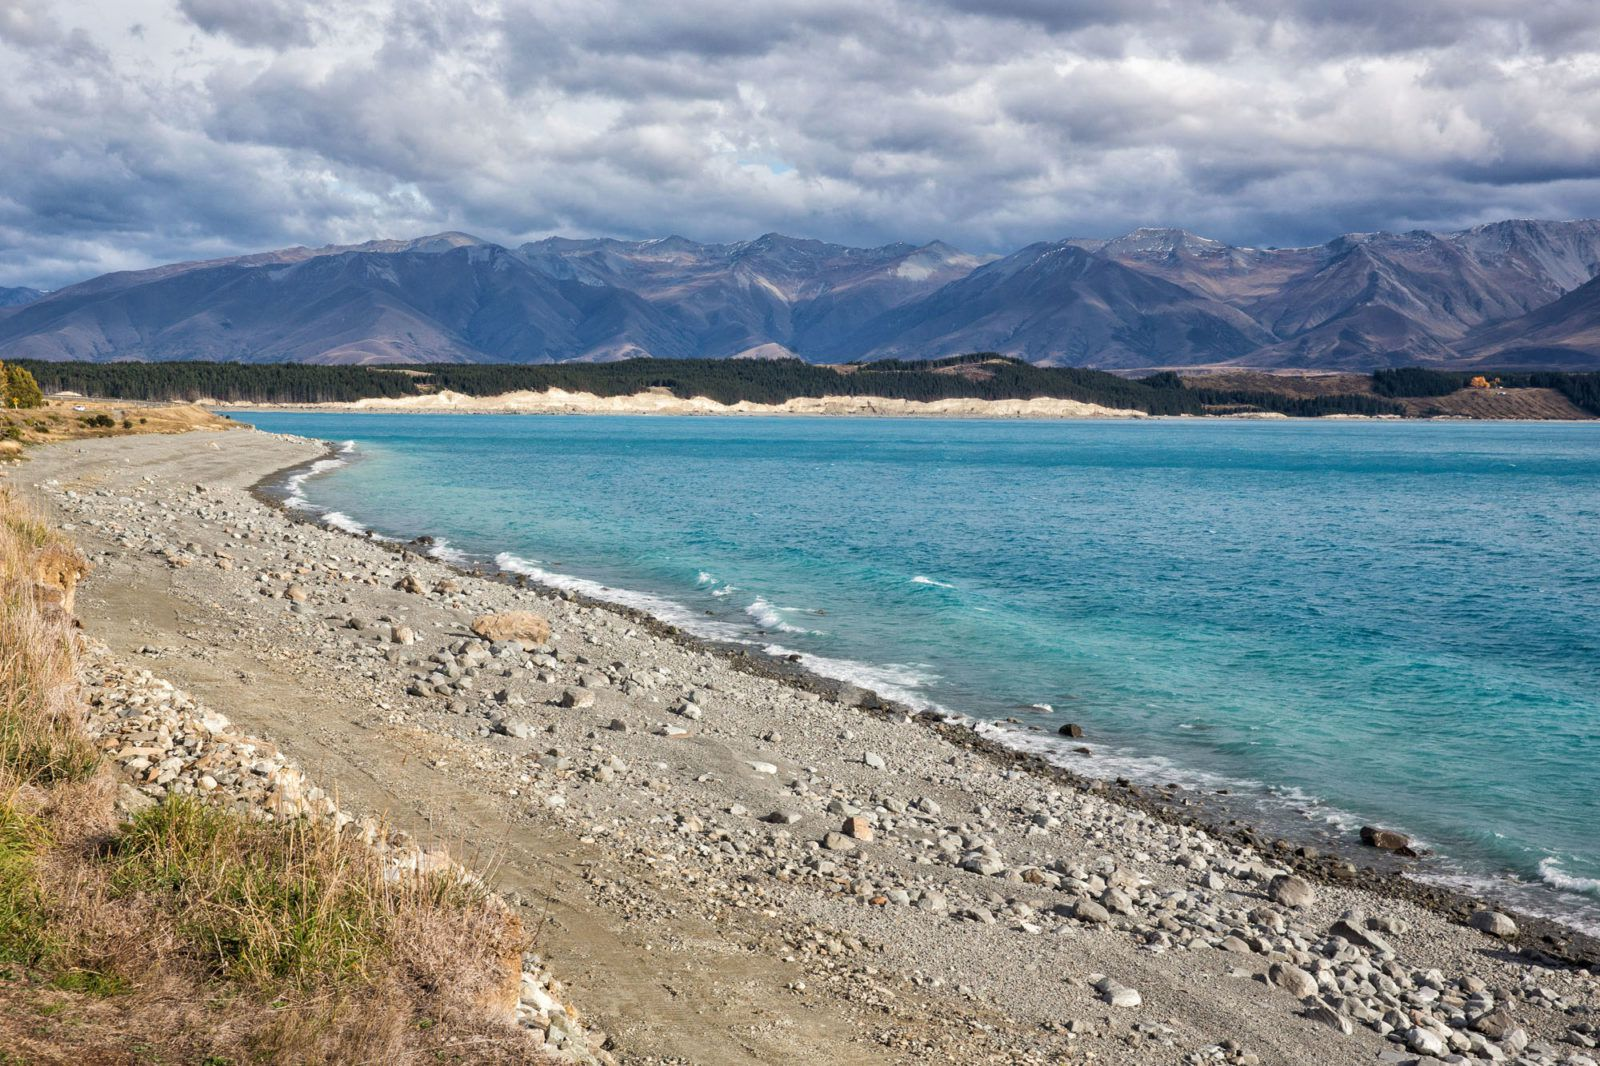 Lake Tekapo in April